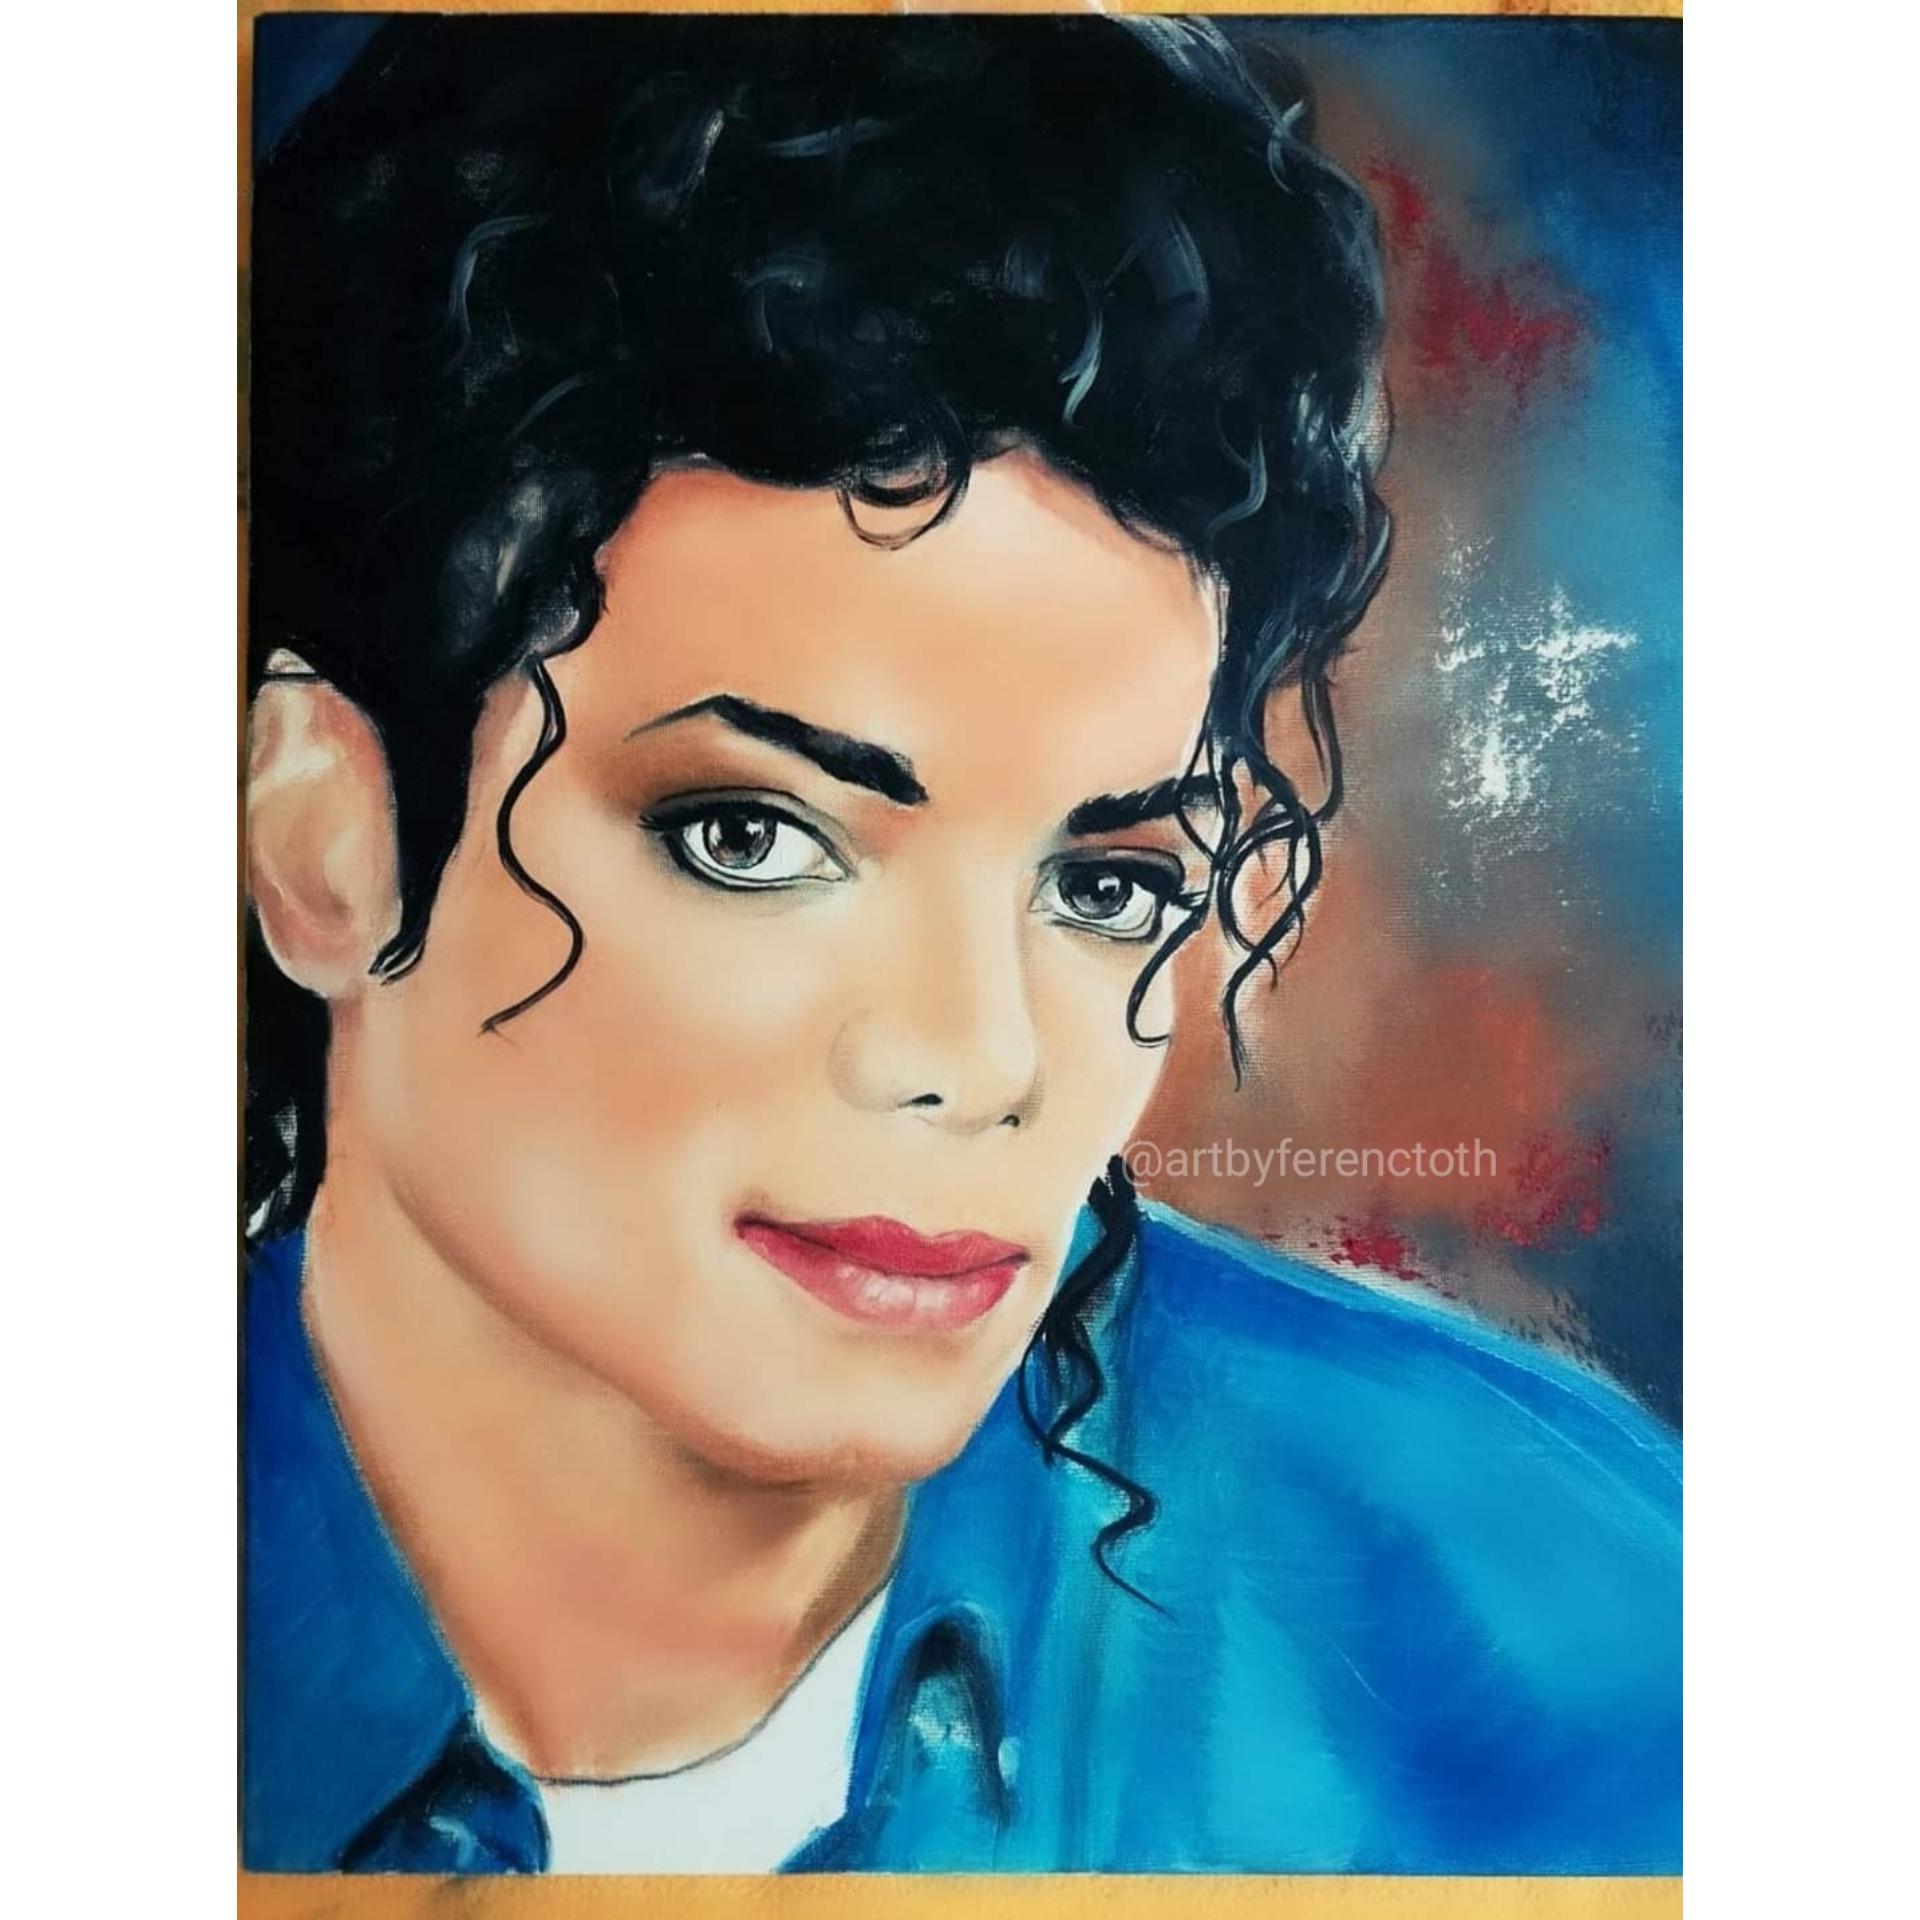 Classic MJ Pepsi Commercial (1984) - HQ - michael jackson